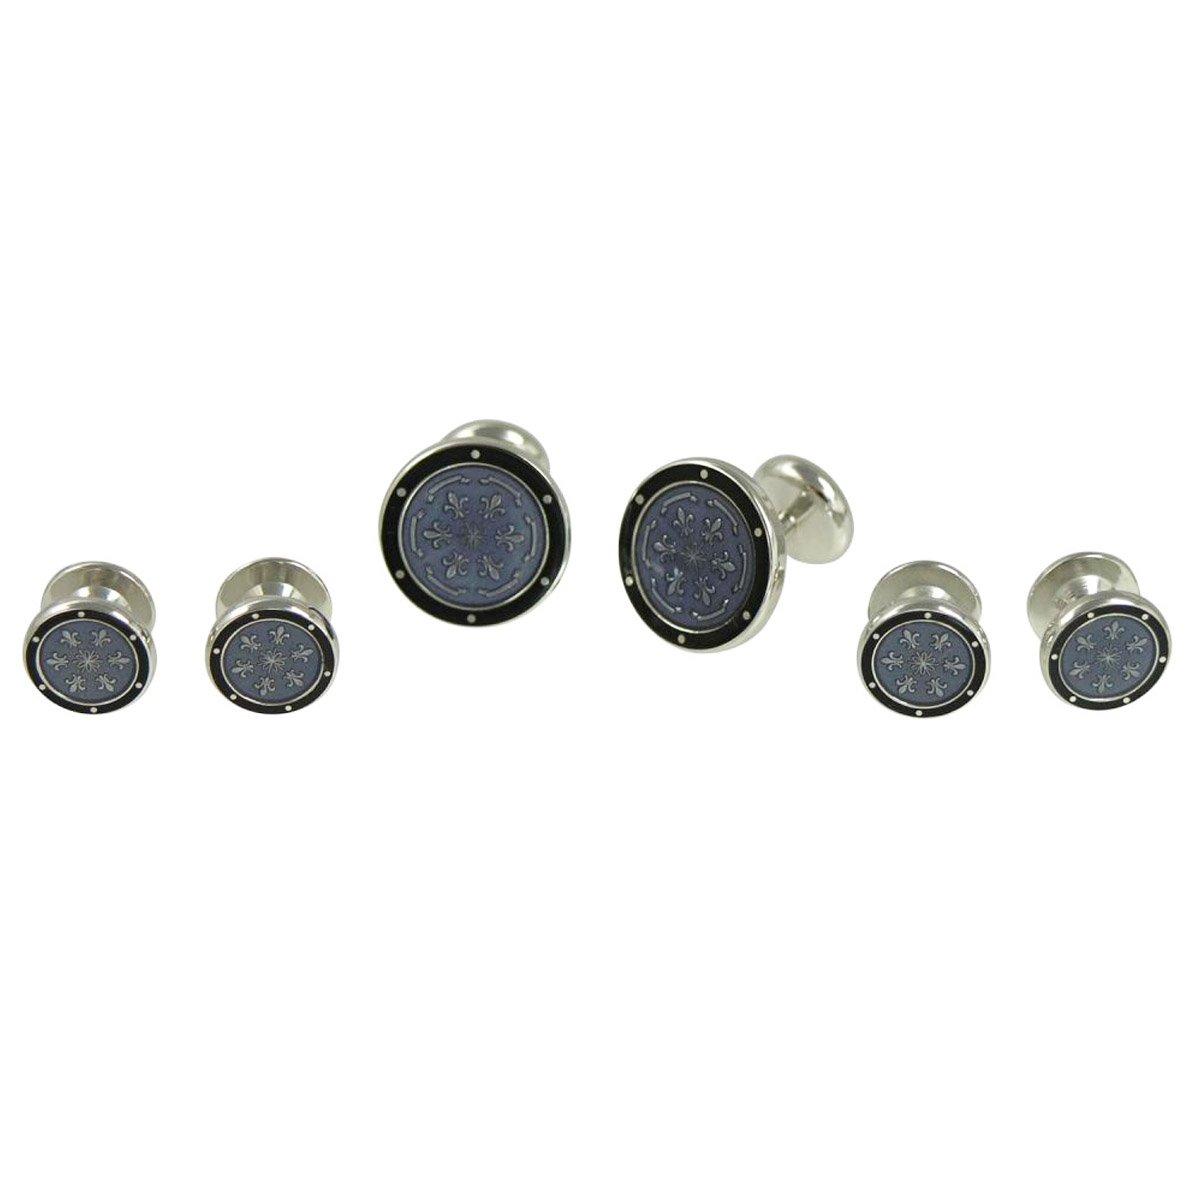 Baade Black and Grey Floral Shirt Stud Cufflinks Set